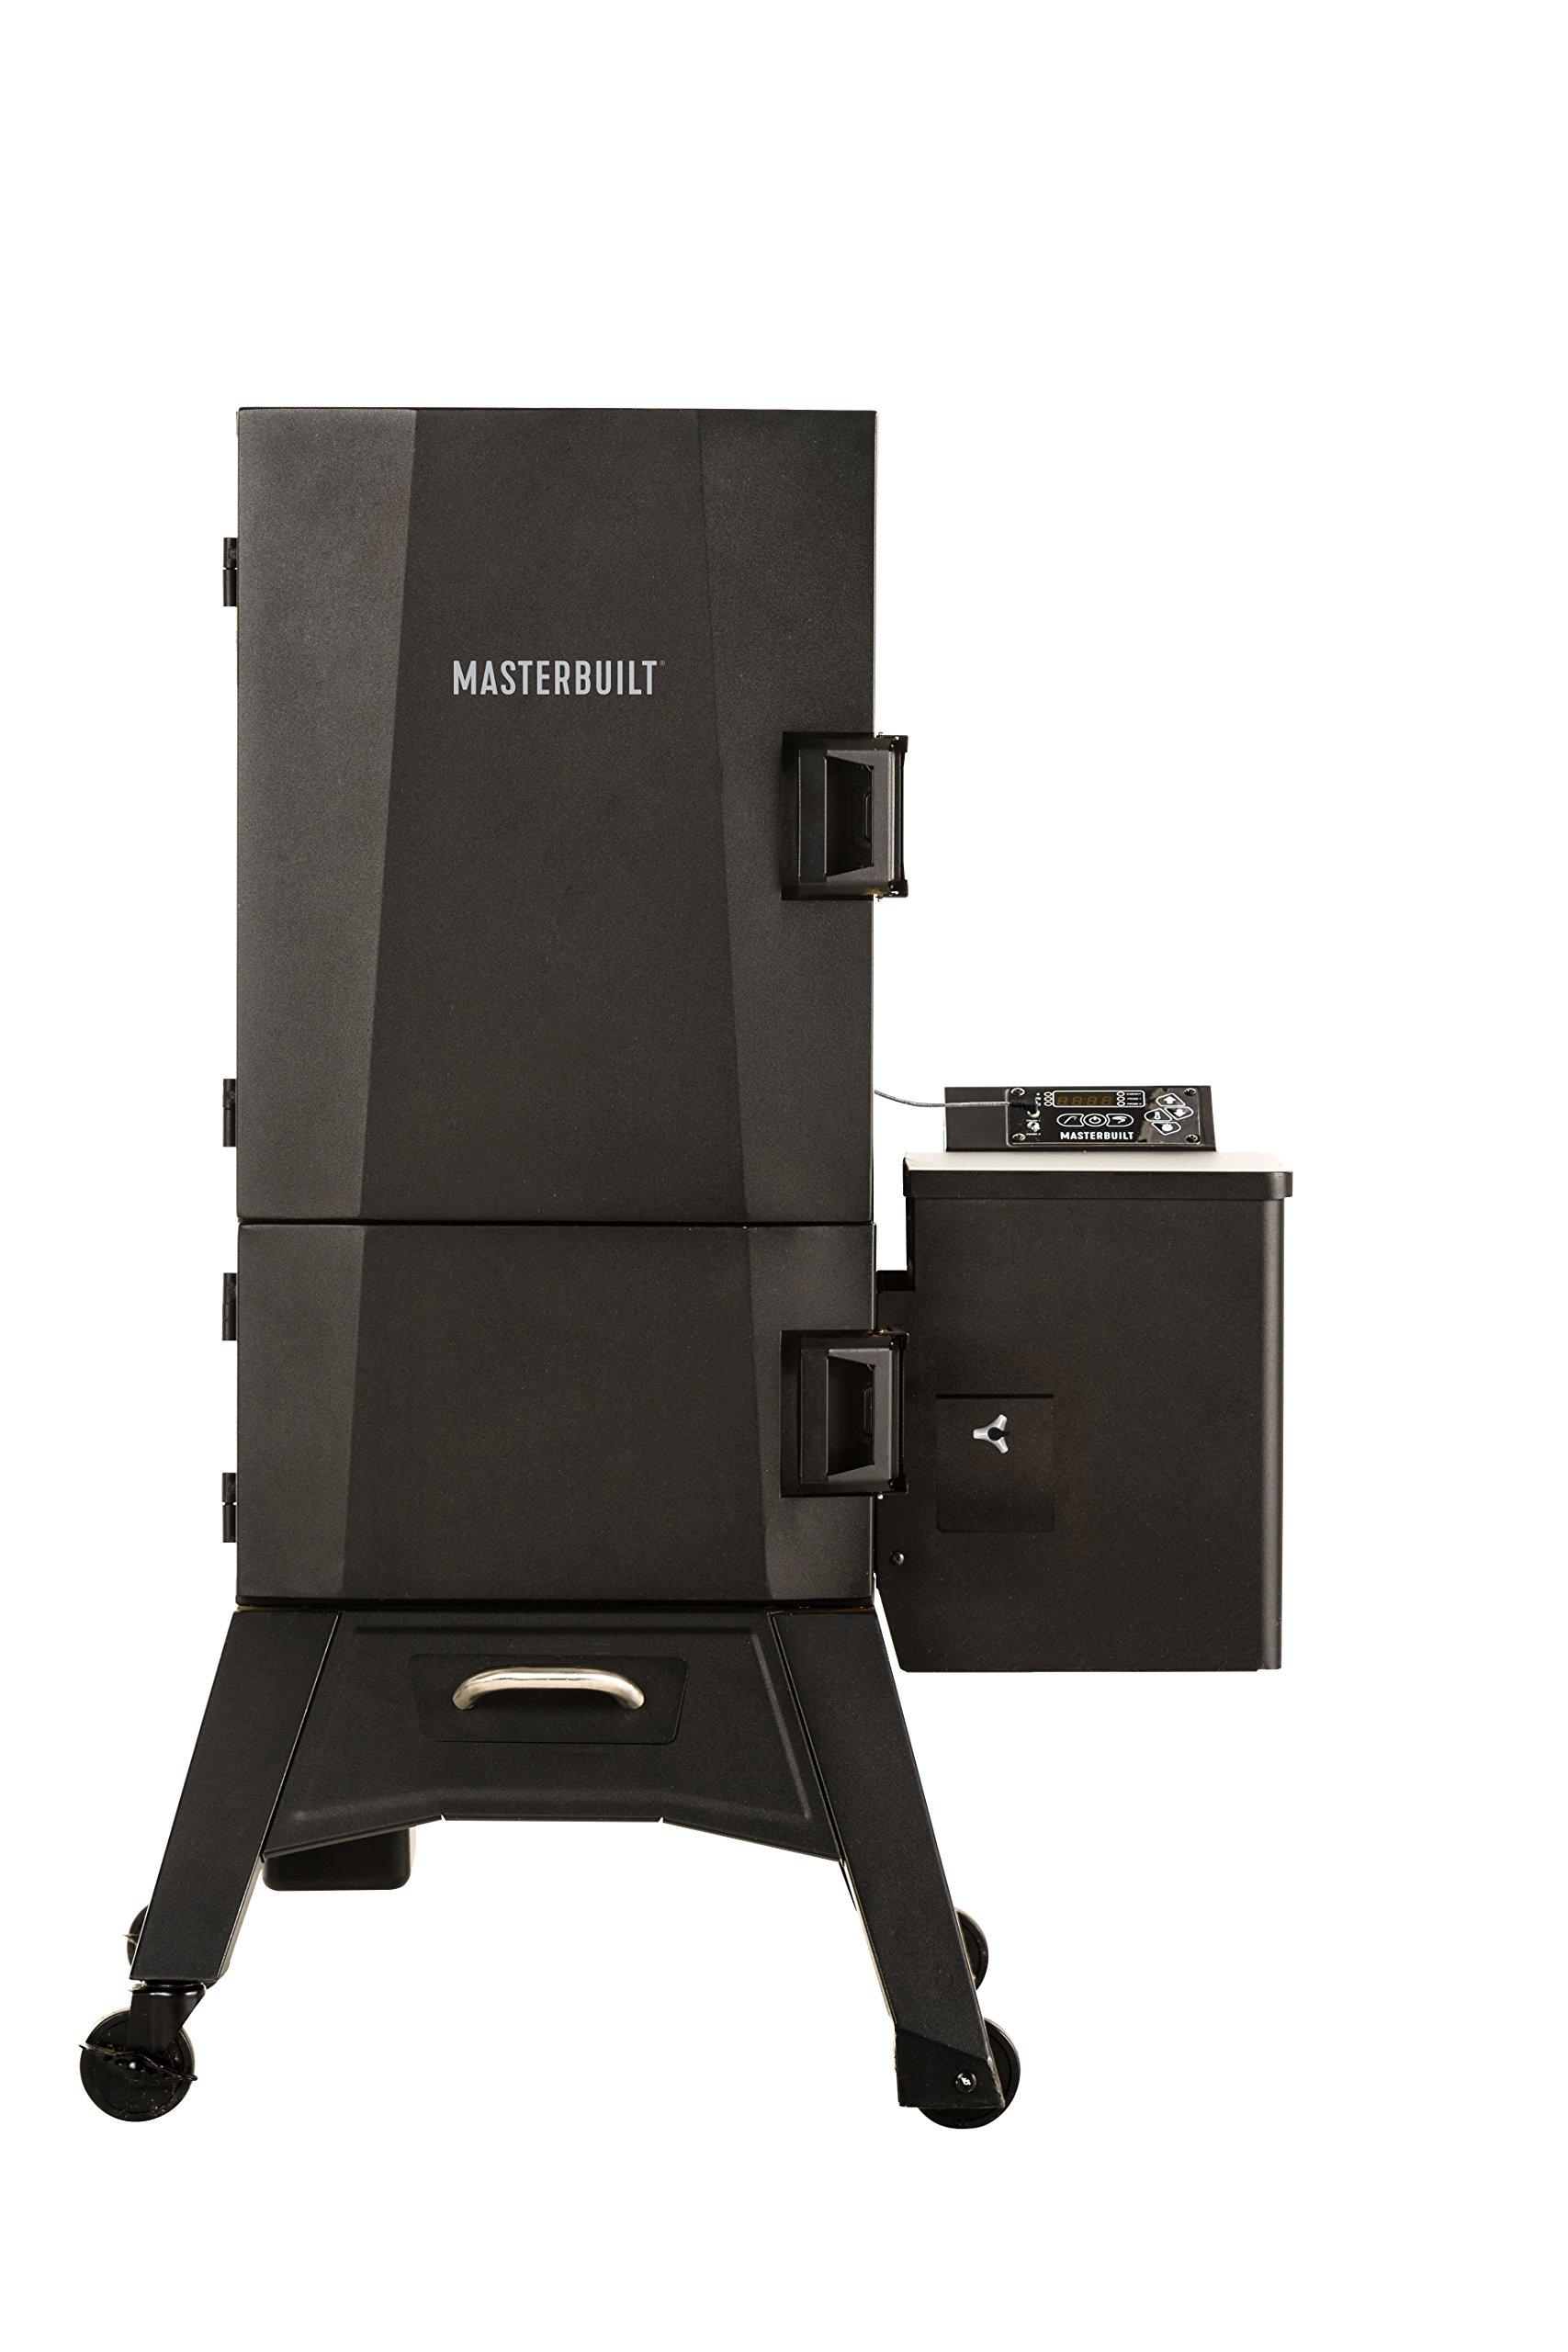 Masterbuilt MB20250618 MWS 330B Pellet Smoker, 30'', Black by Masterbuilt